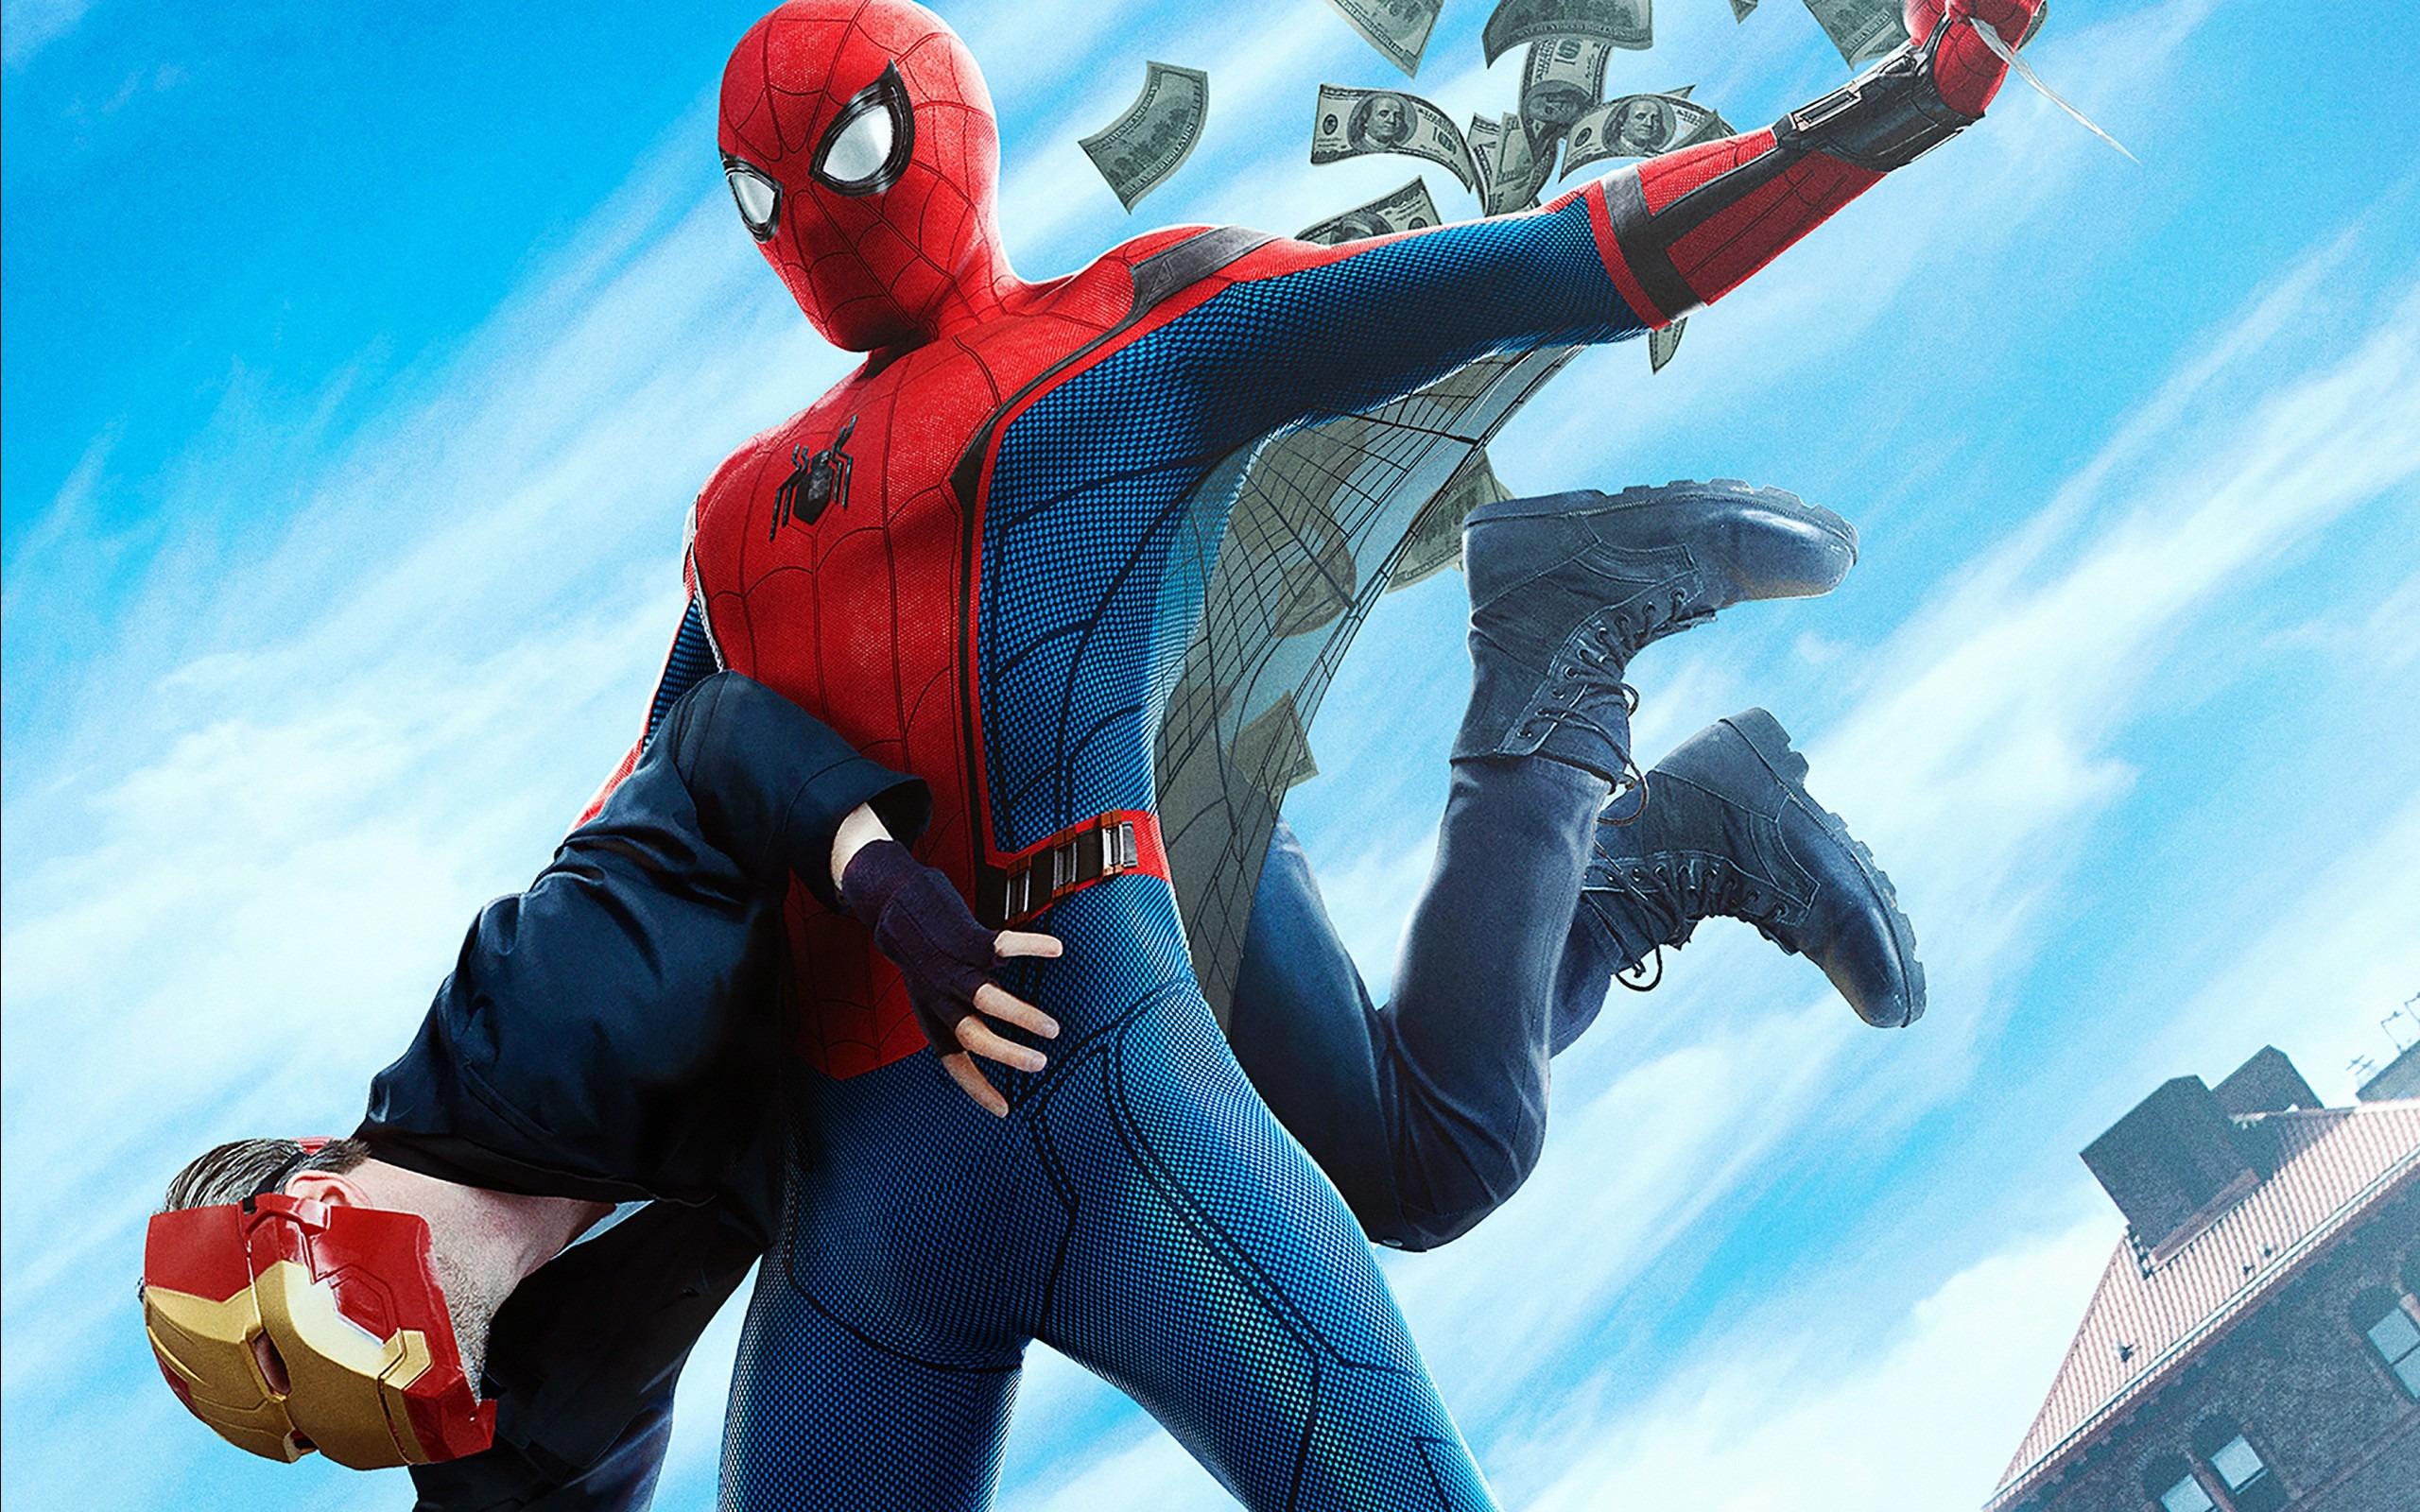 2017 Spider Man Homecoming Hd Movie Wallpaper 16 Avance